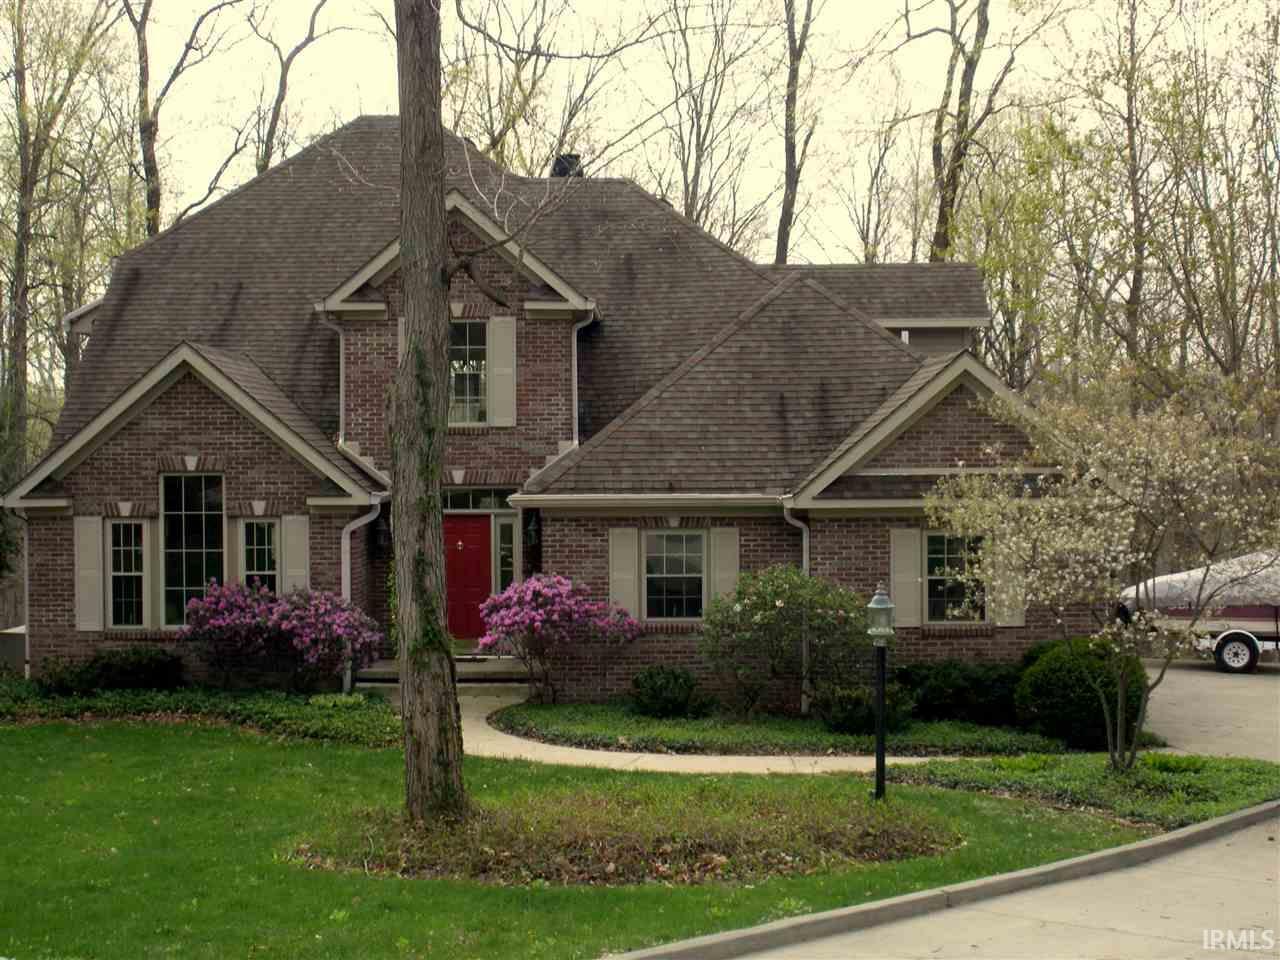 560 N Tulip, Crawfordsville, IN 47933